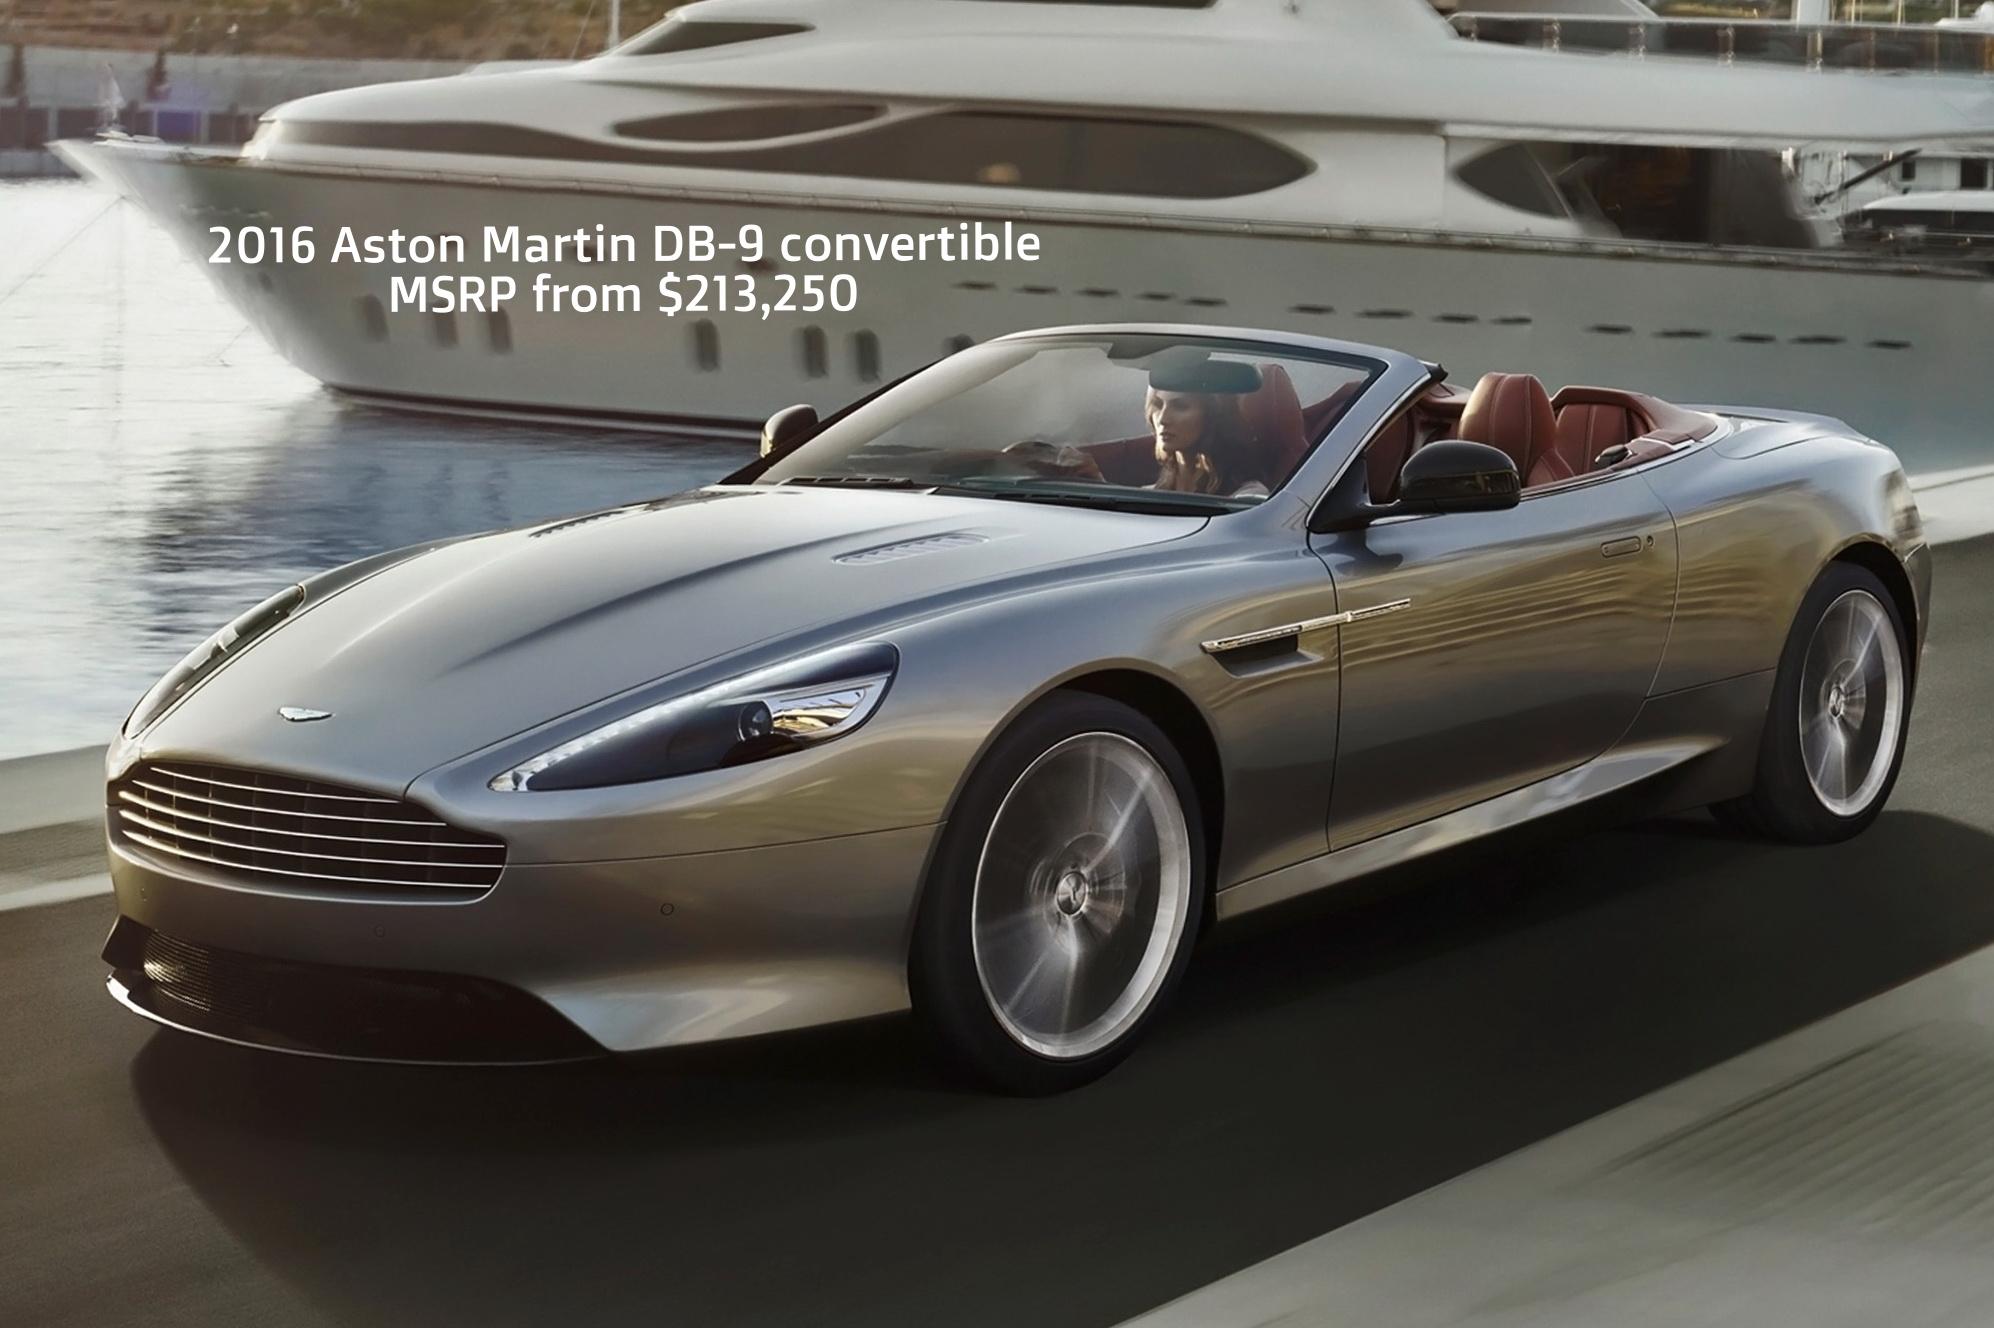 2016 Aston Martin DB9 Convertible.jpg